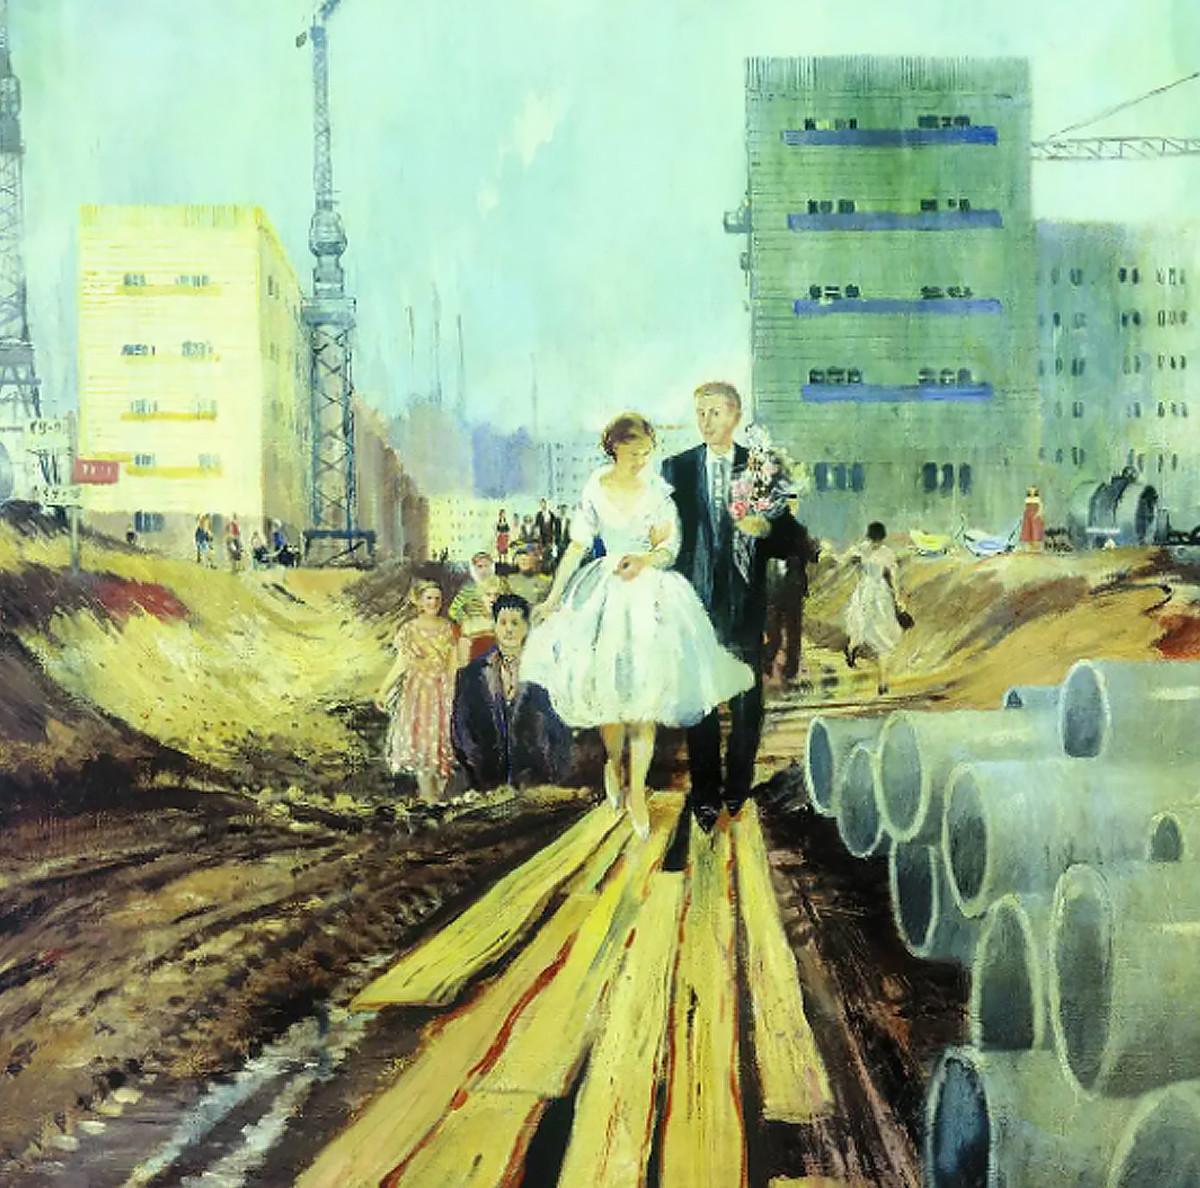 Mariage dans la rue de demain, 1962. Iouri Pimenov